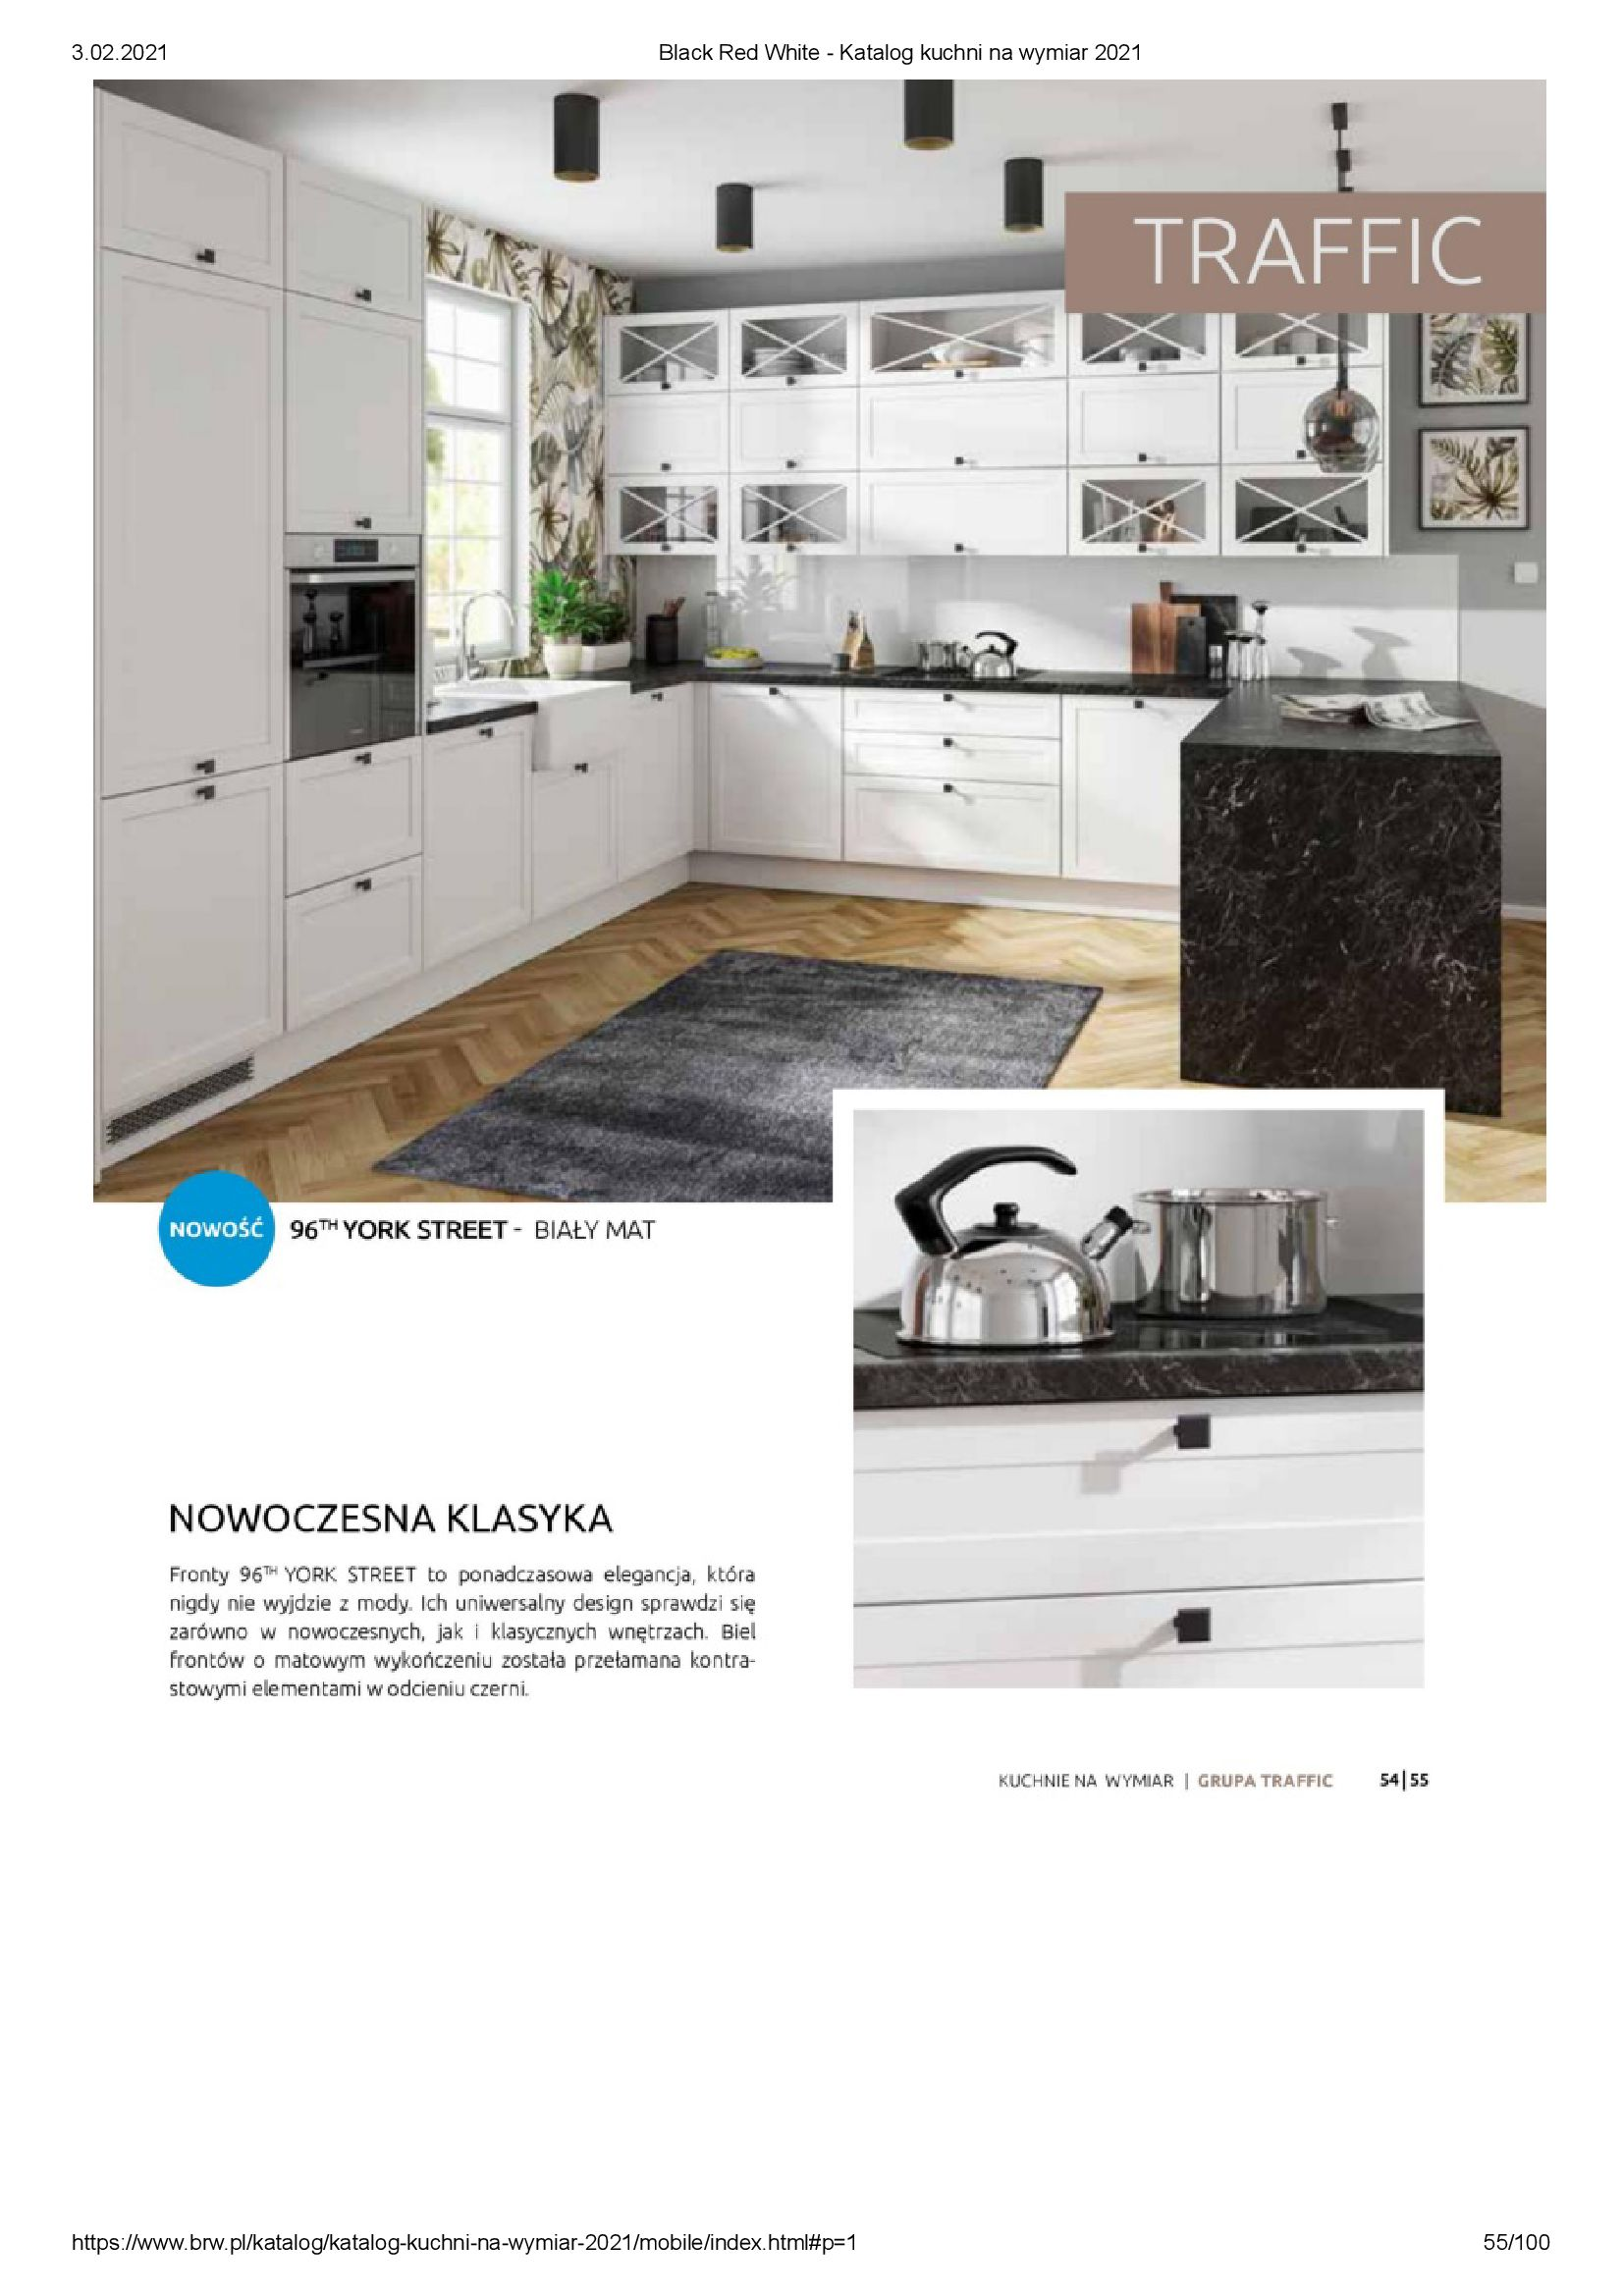 Gazetka Black Red White: Katalog - Kuchnie na wymiar Senso Kitchens 2021 2021-01-01 page-55